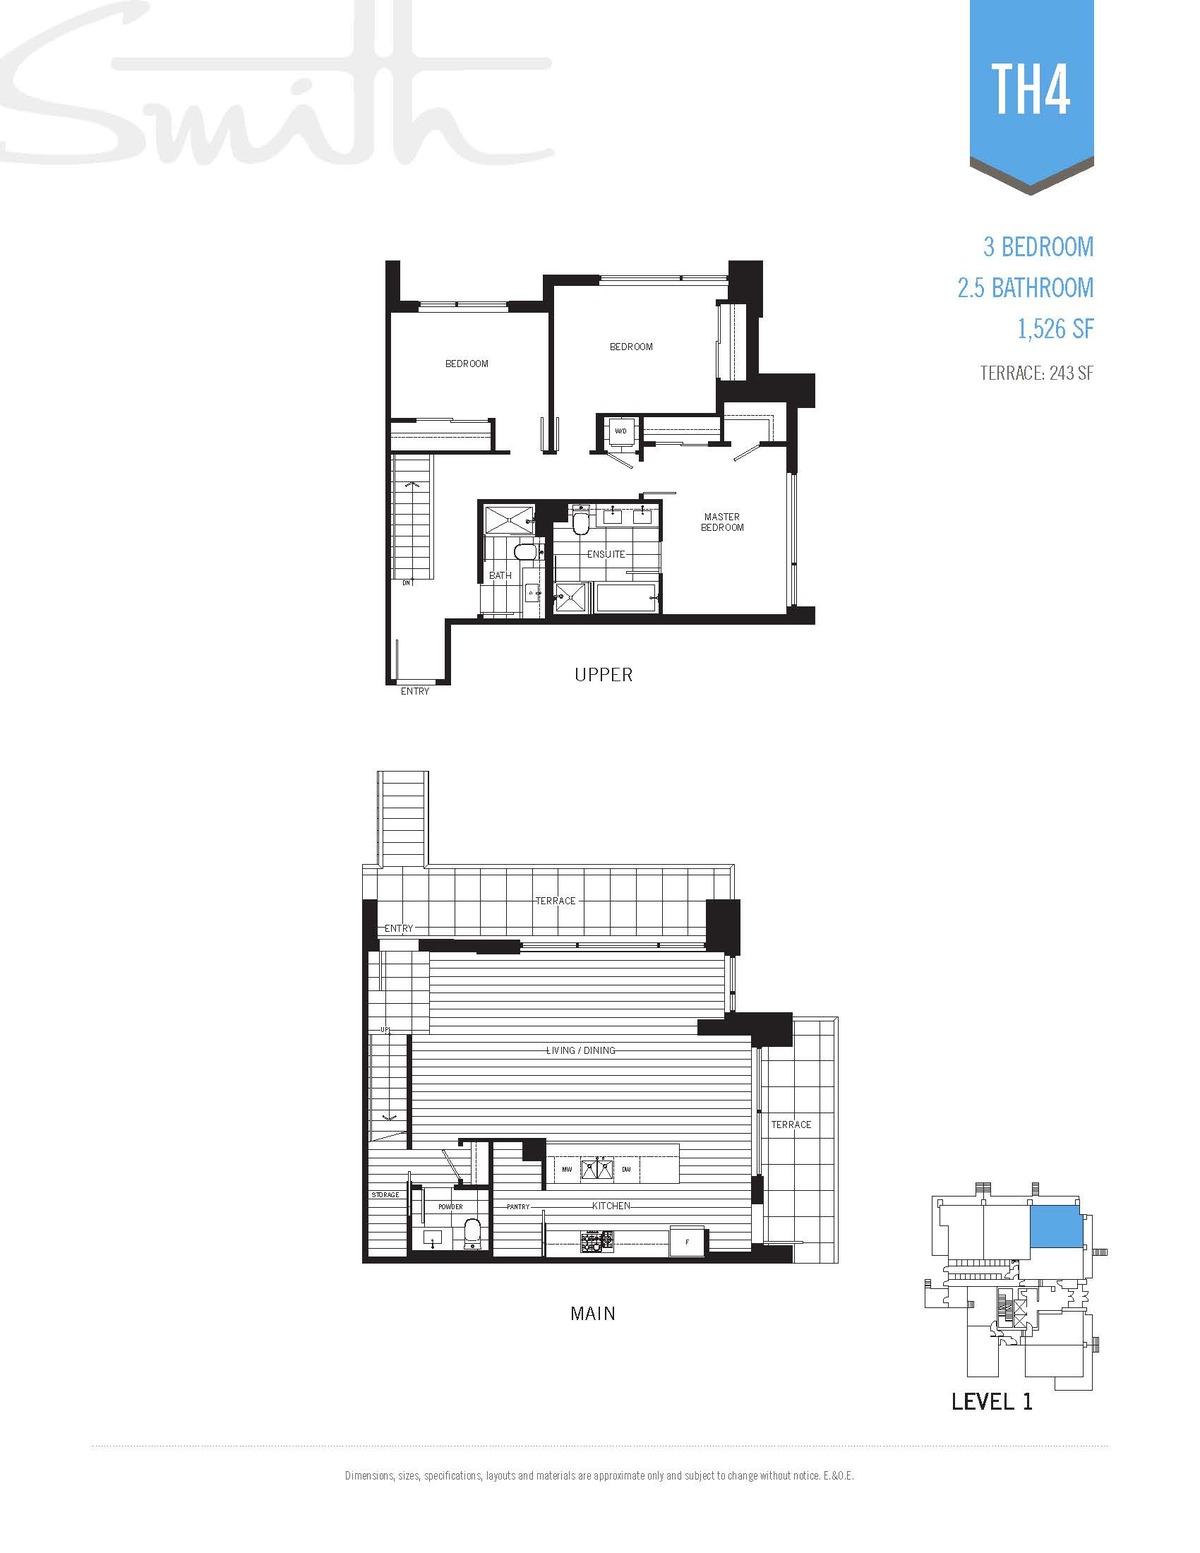 Smith Floorplan TH4